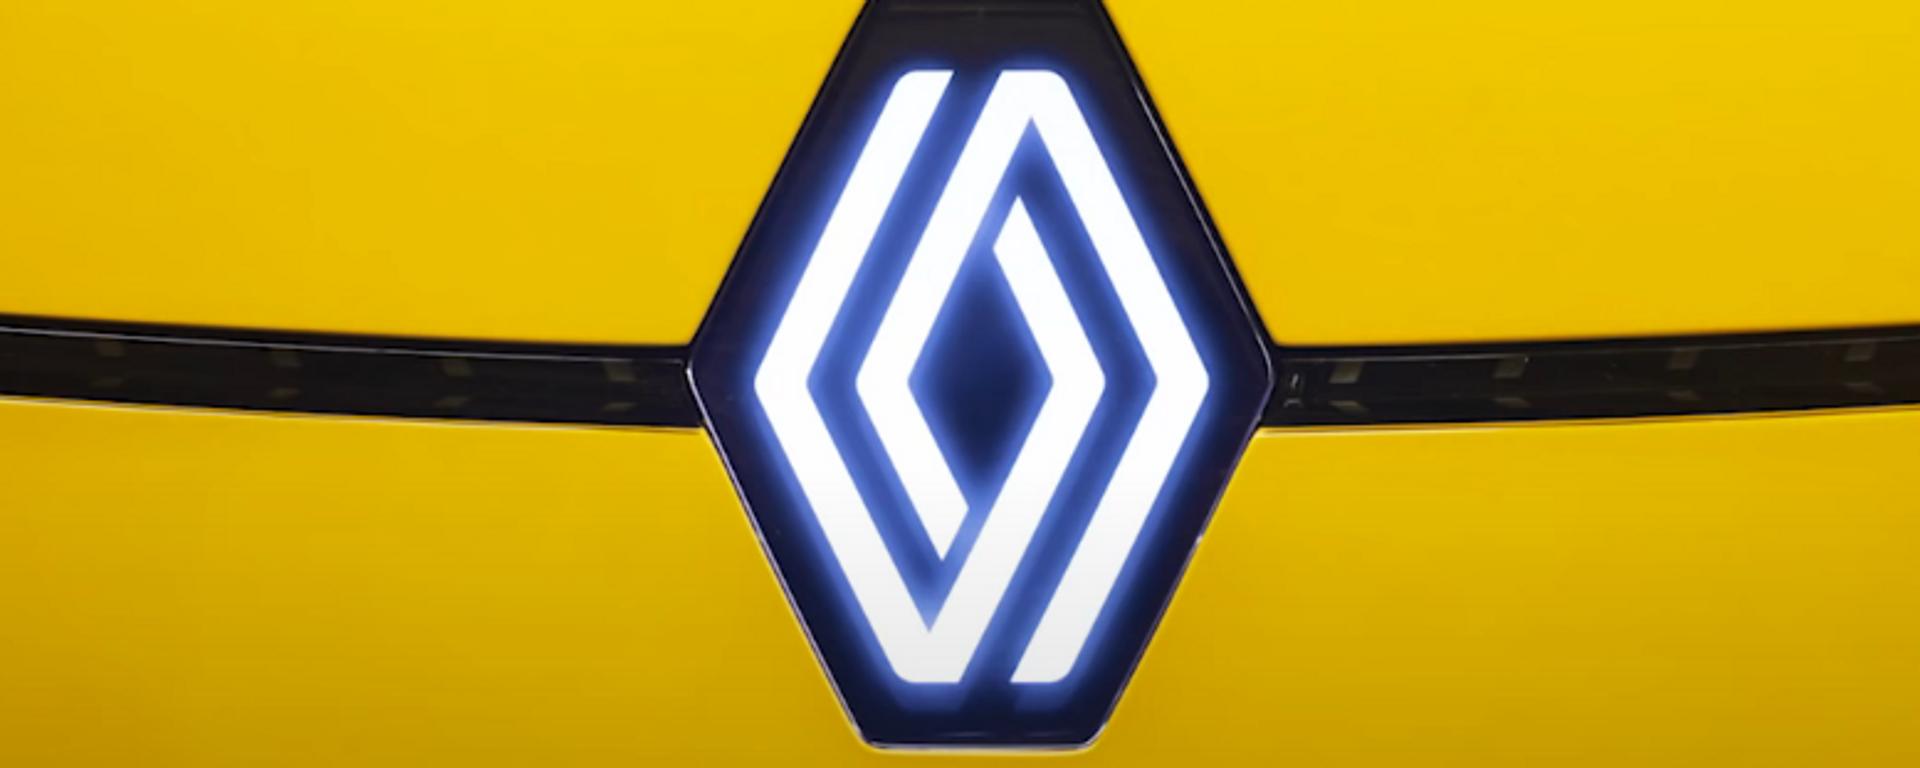 El logo de Renault del 2021 - Sputnik Mundo, 1920, 25.05.2021